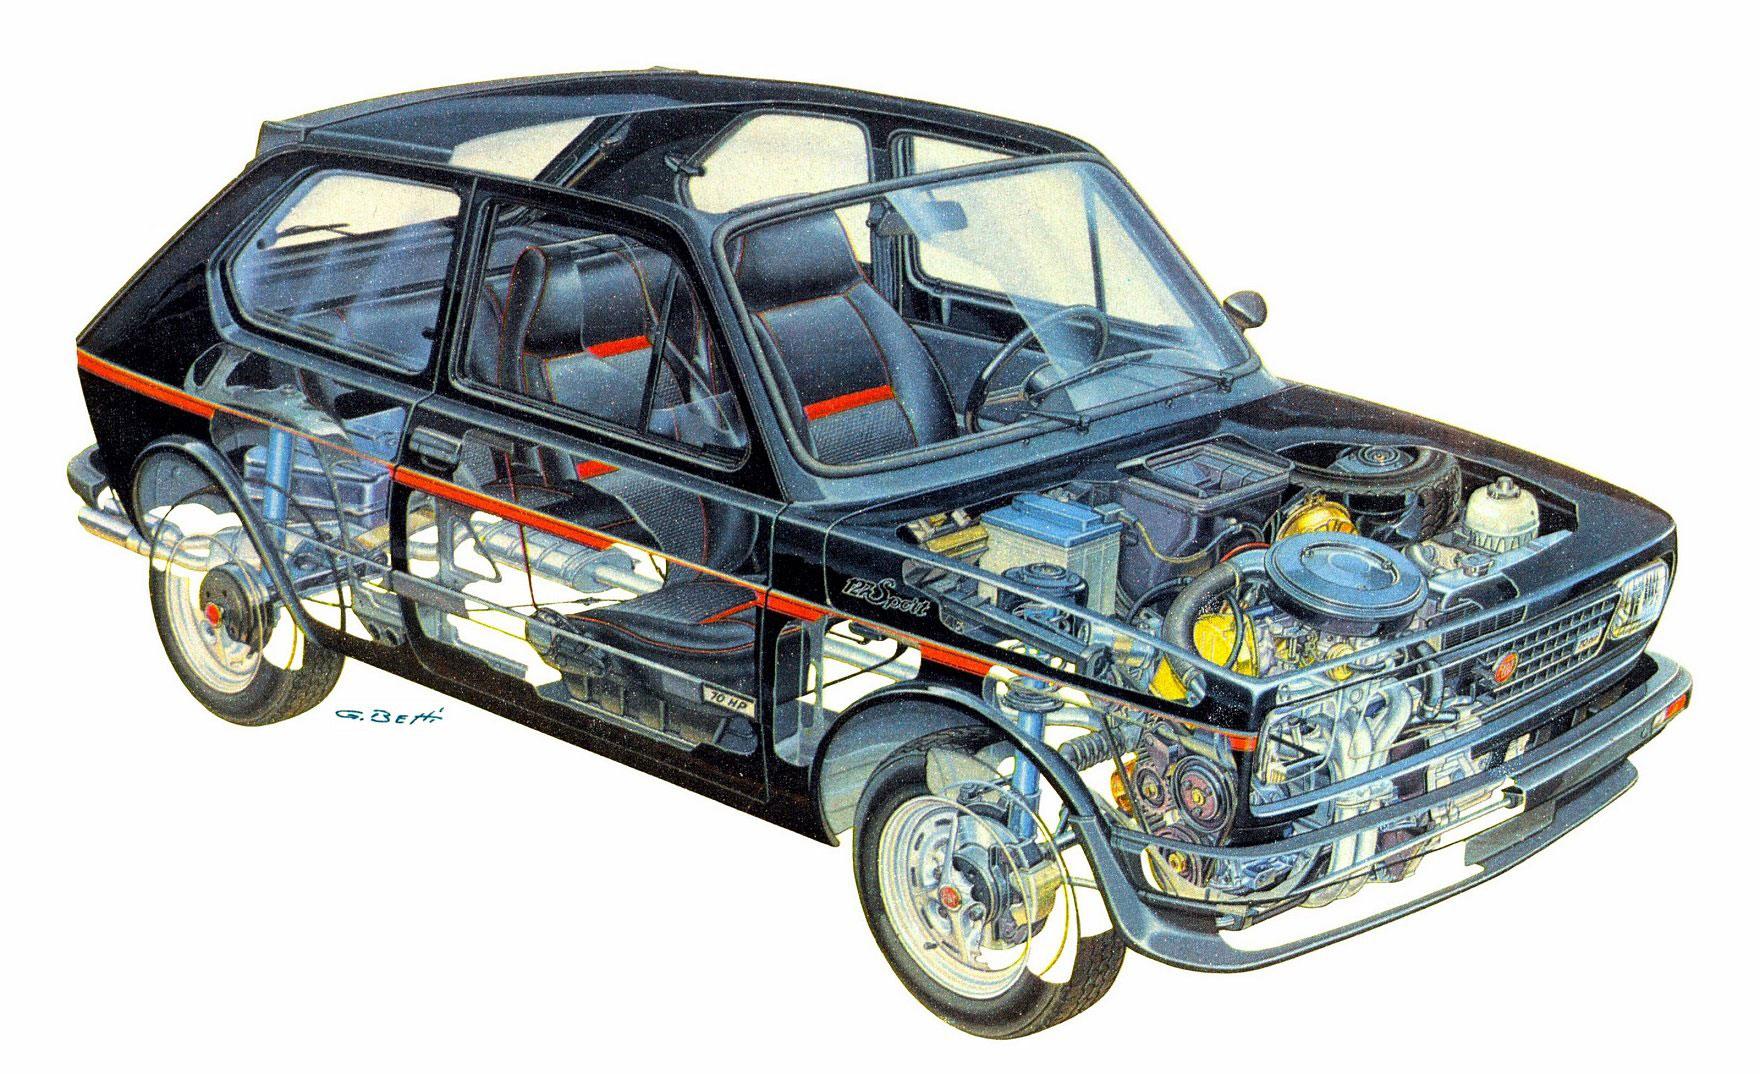 Fiat 127 cutaway drawing